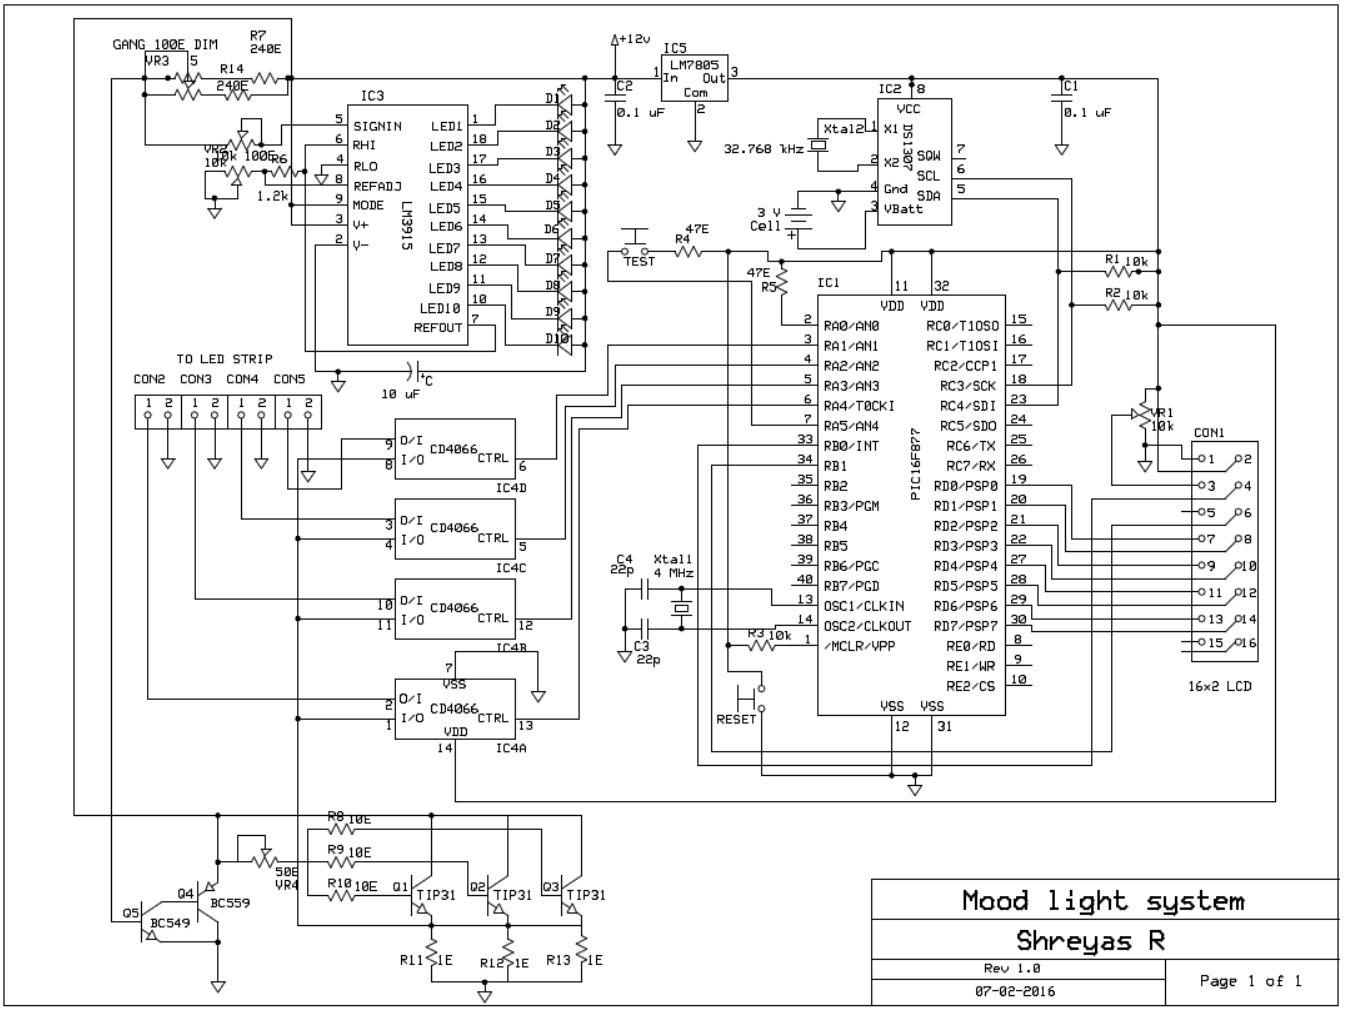 Microcontroller Based Mood Light All Things S C I E N C E